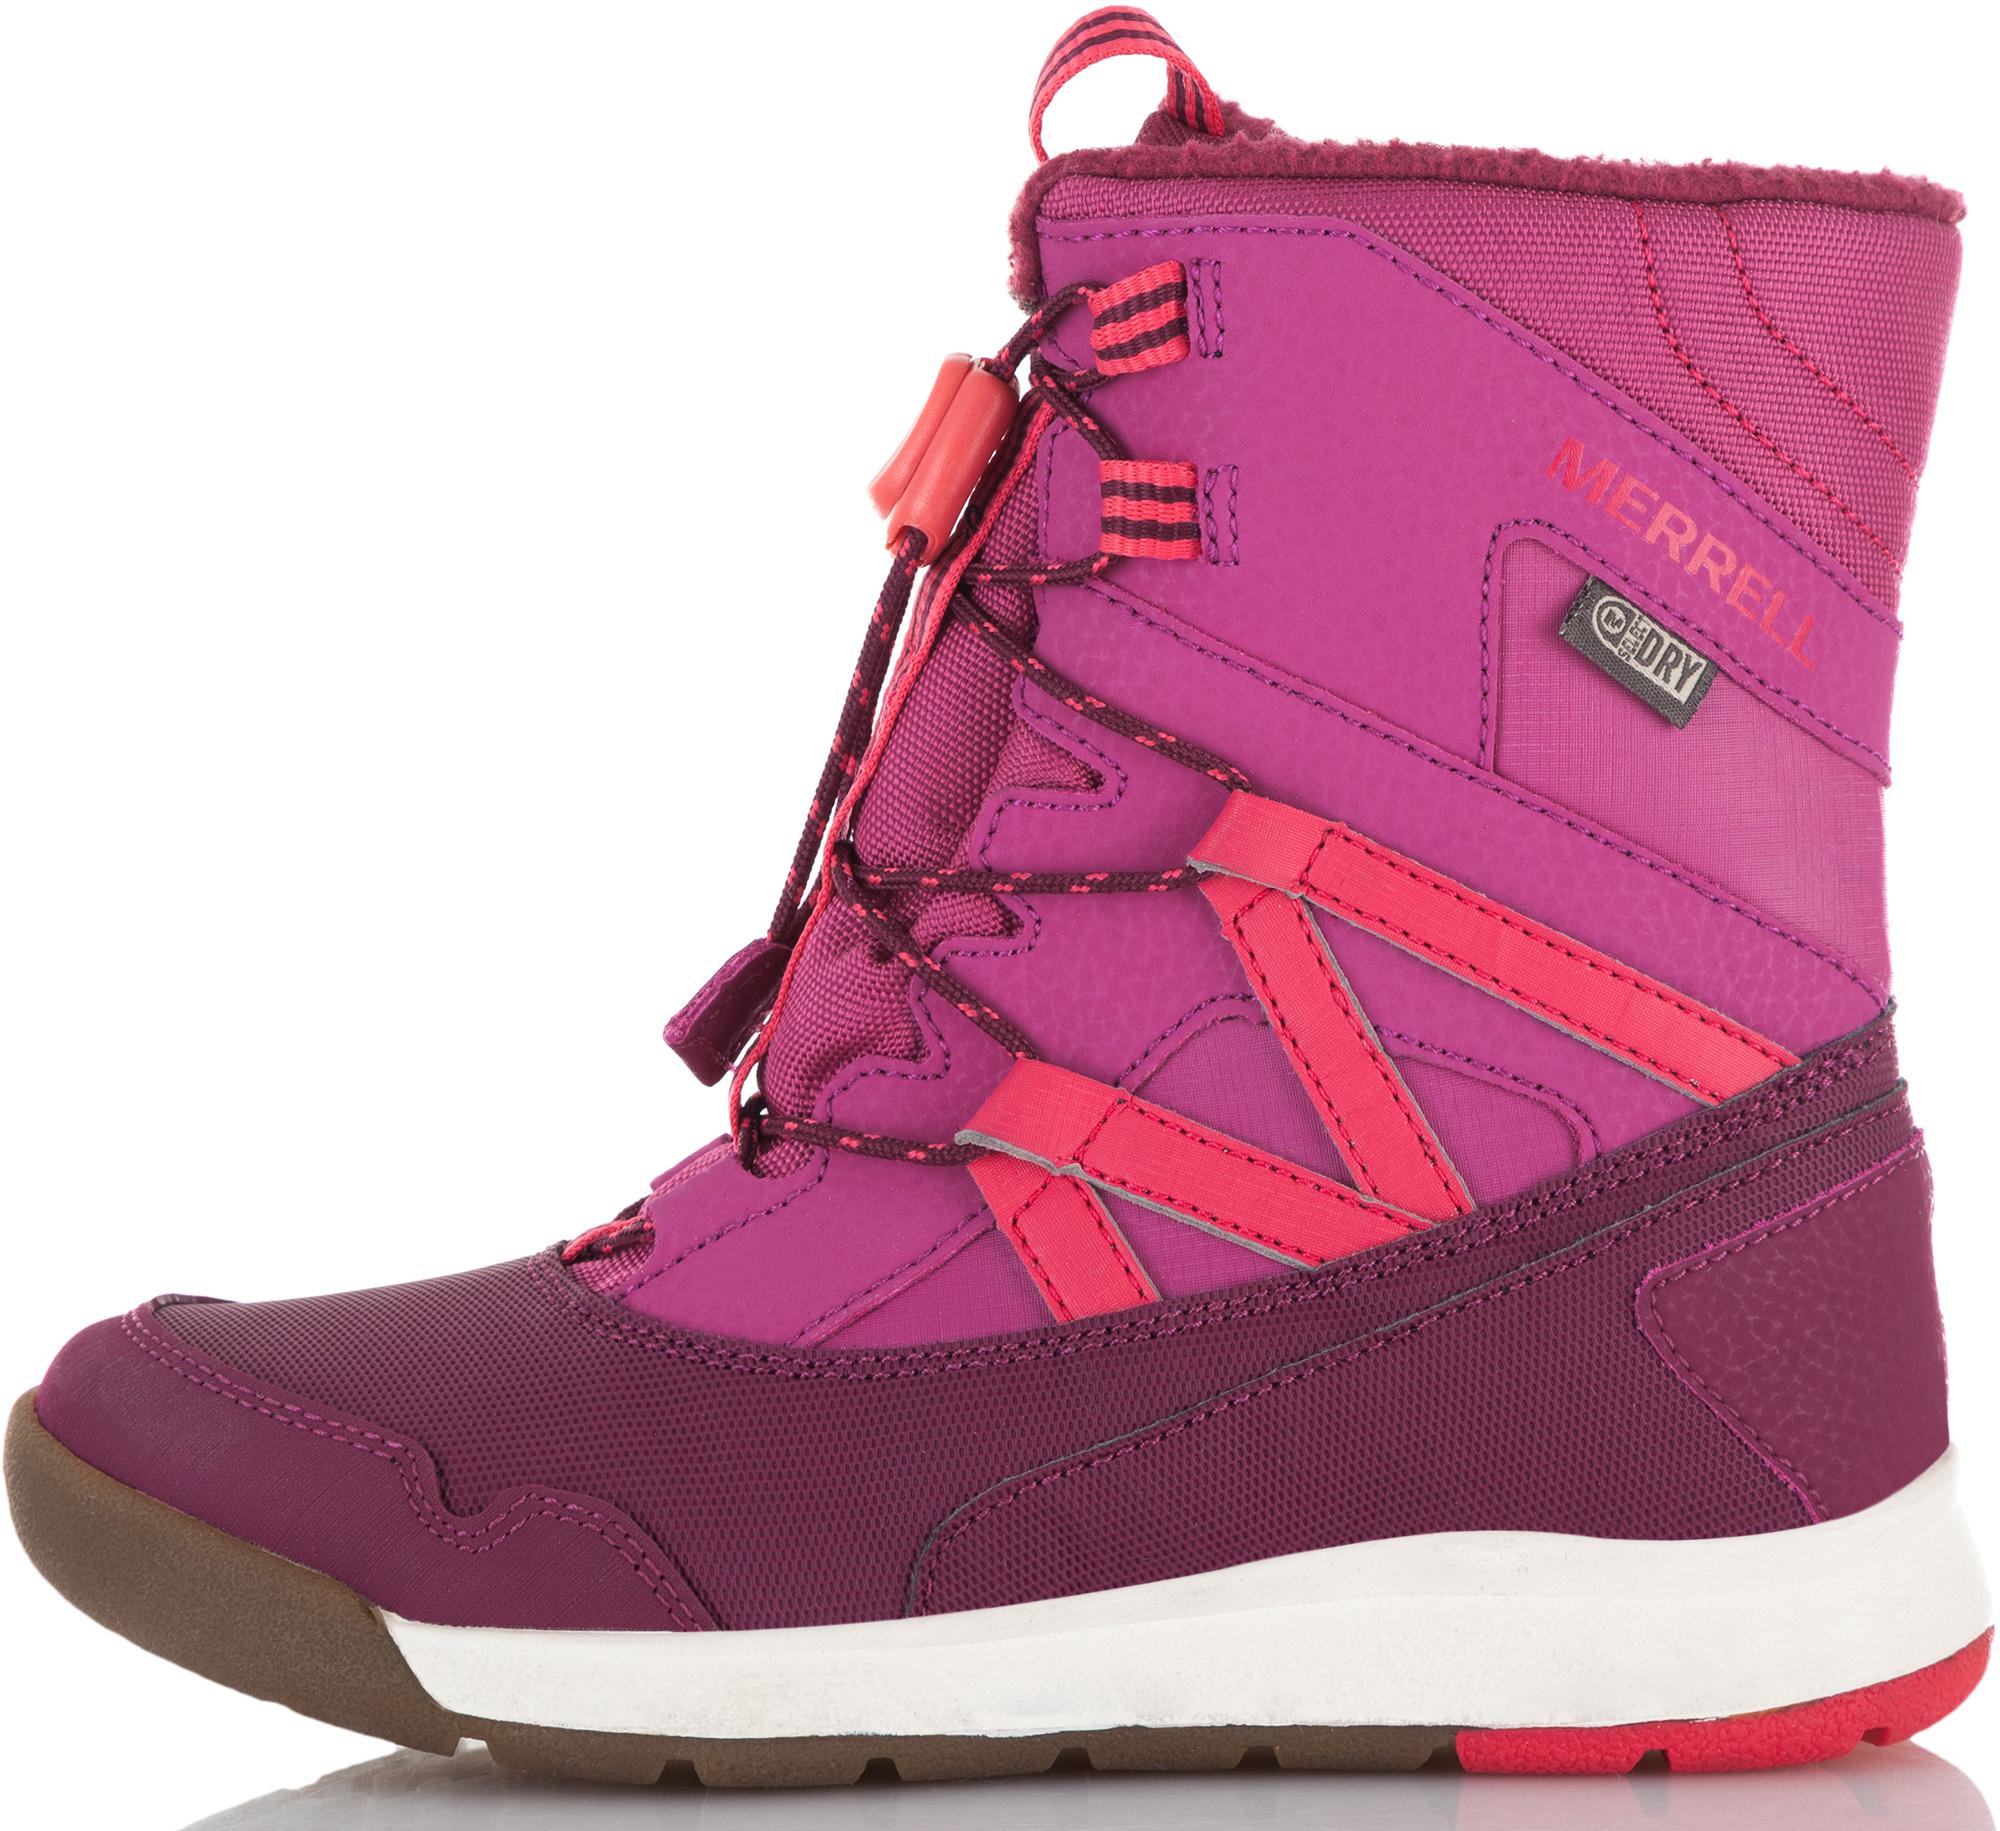 Merrell Ботинки утепленные для девочек M-Snow Crush Wtrpf, размер 34,5